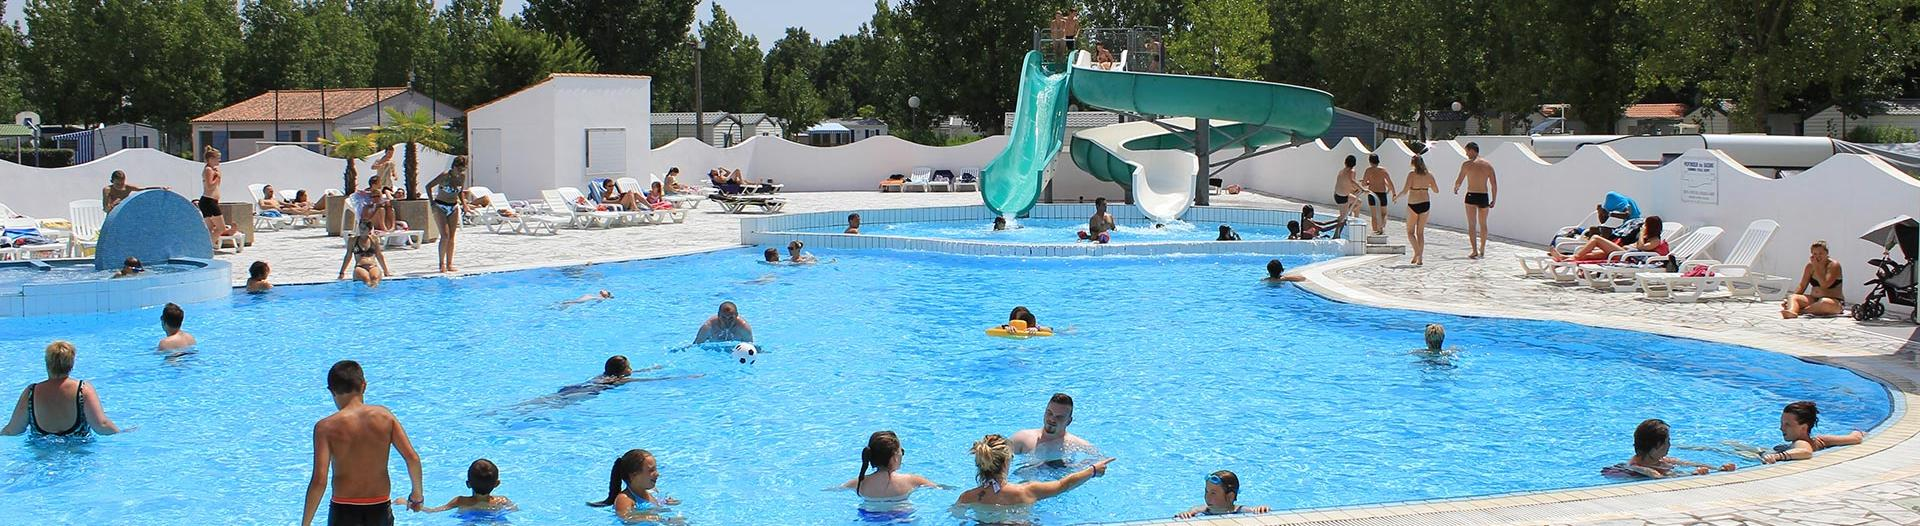 slider-camping-atlantique-vendee-piscine-et-toboggan